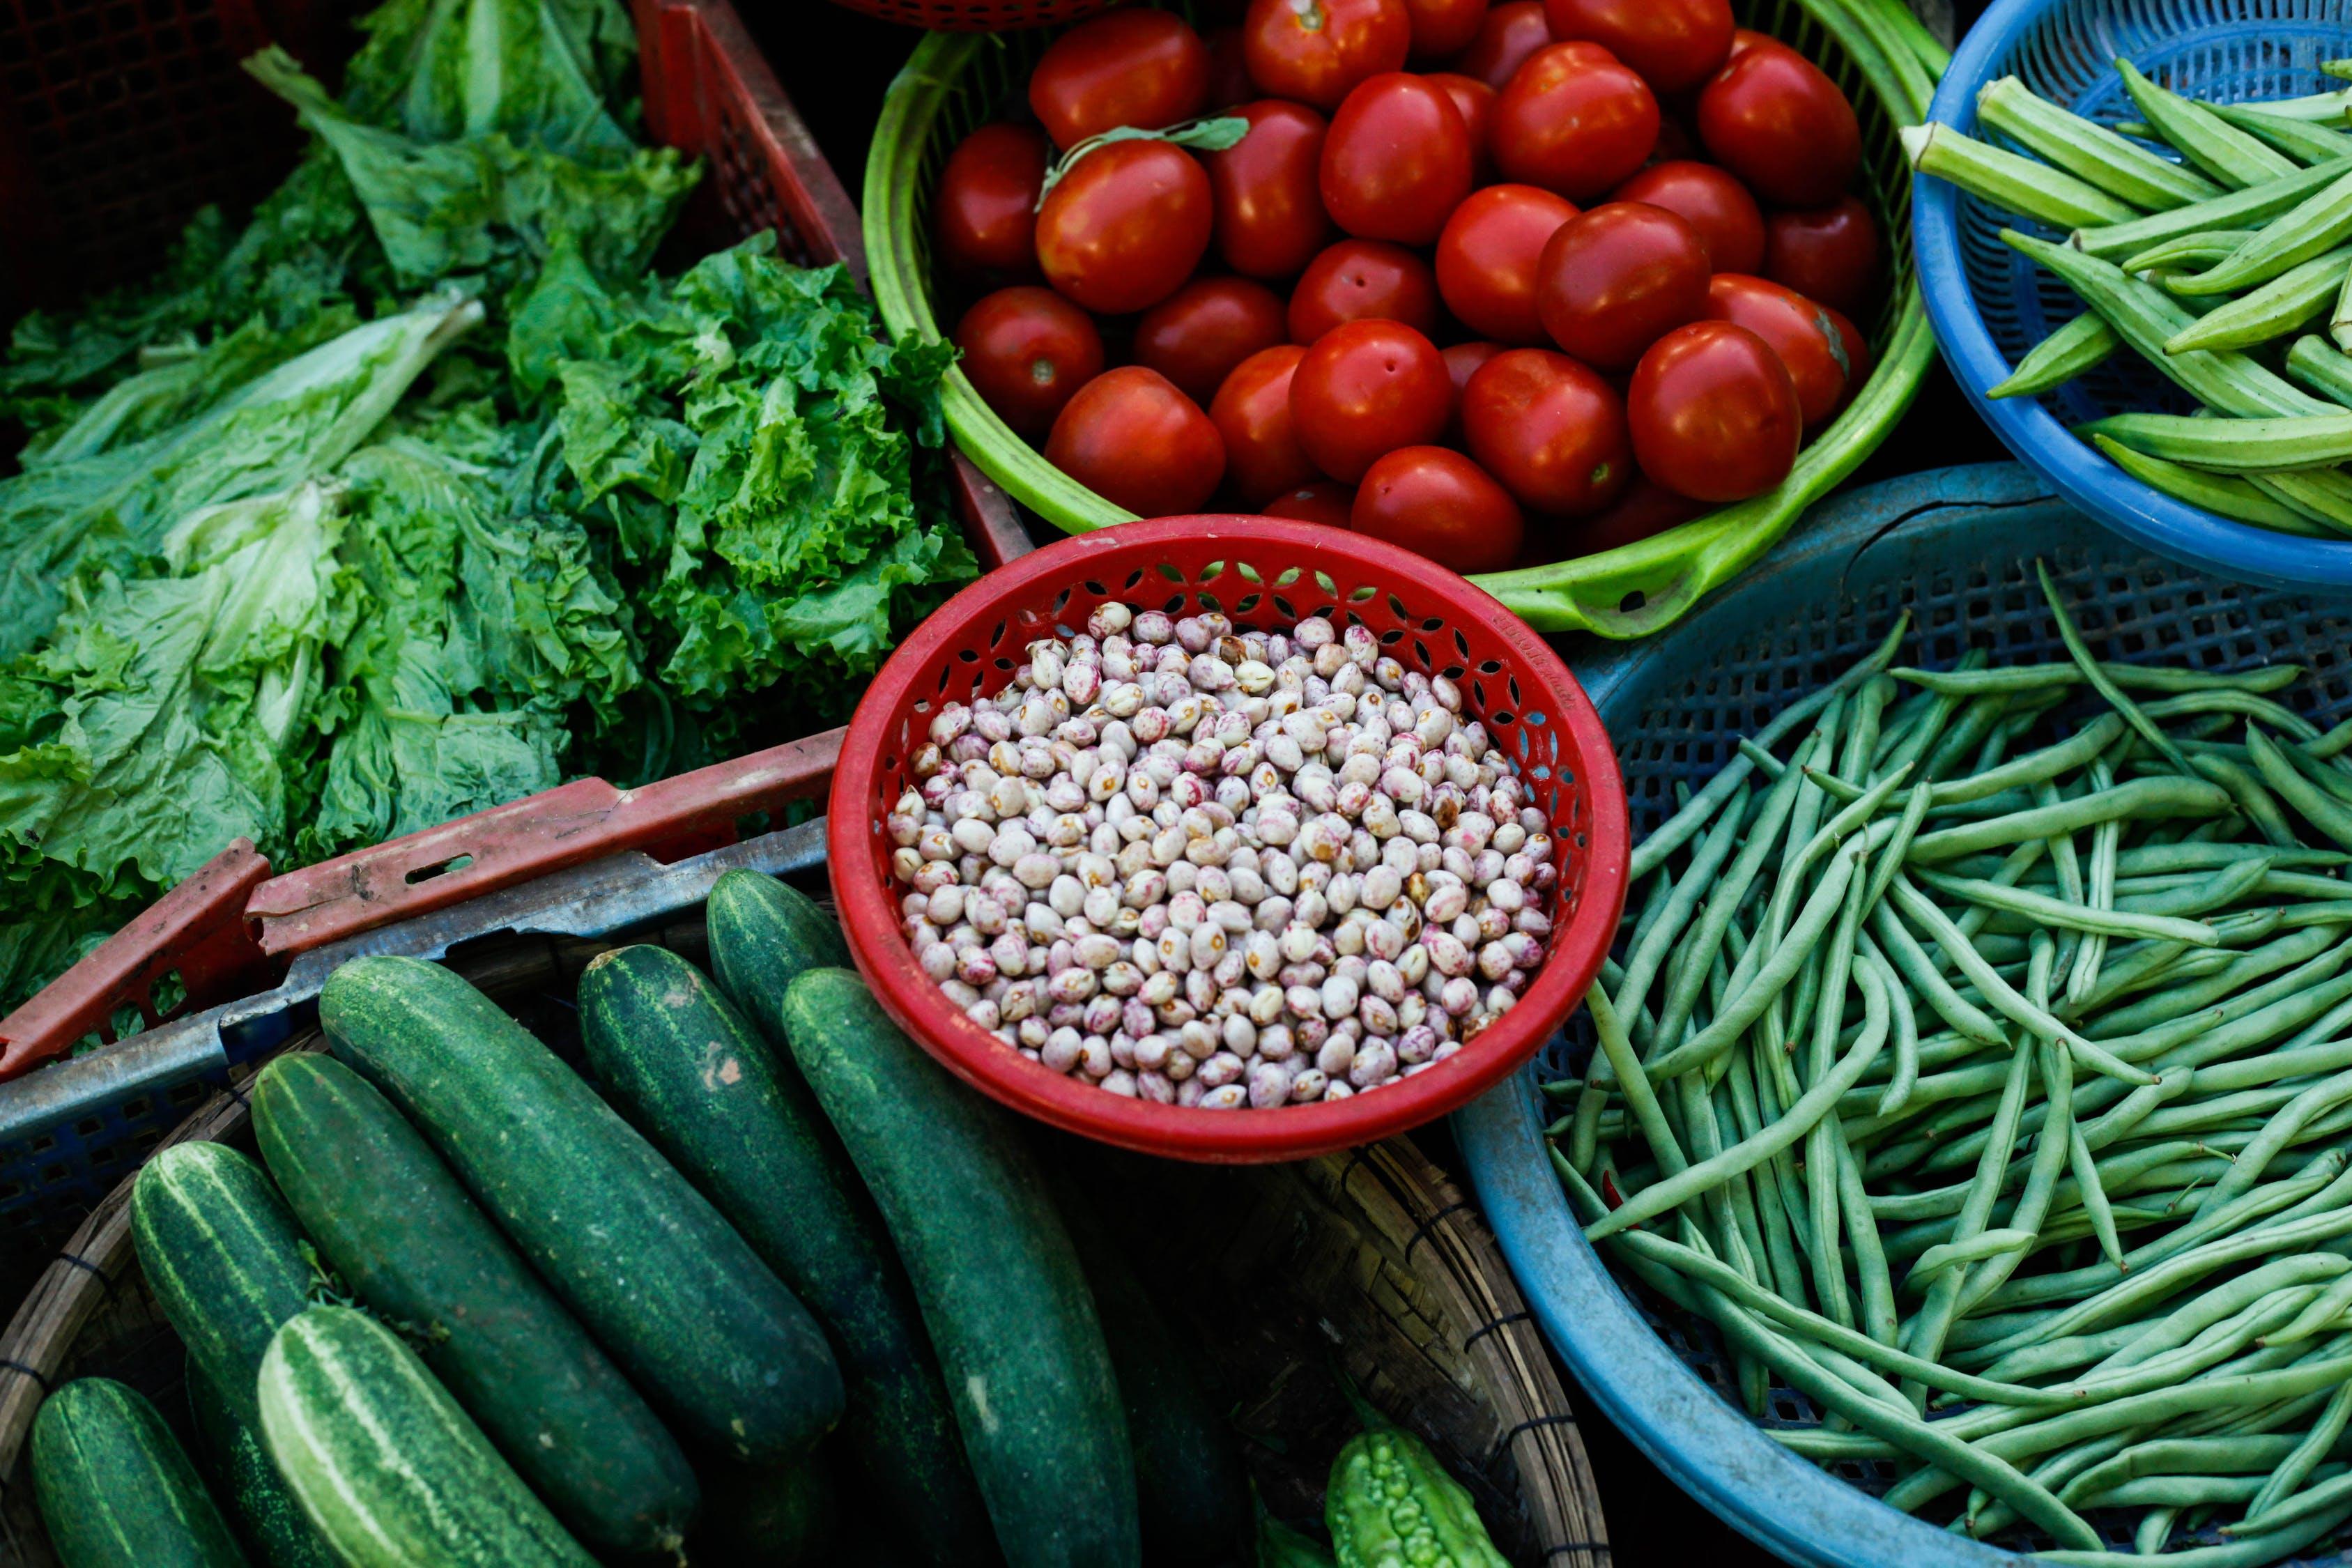 Assorted Vegetables on PLastic Trays